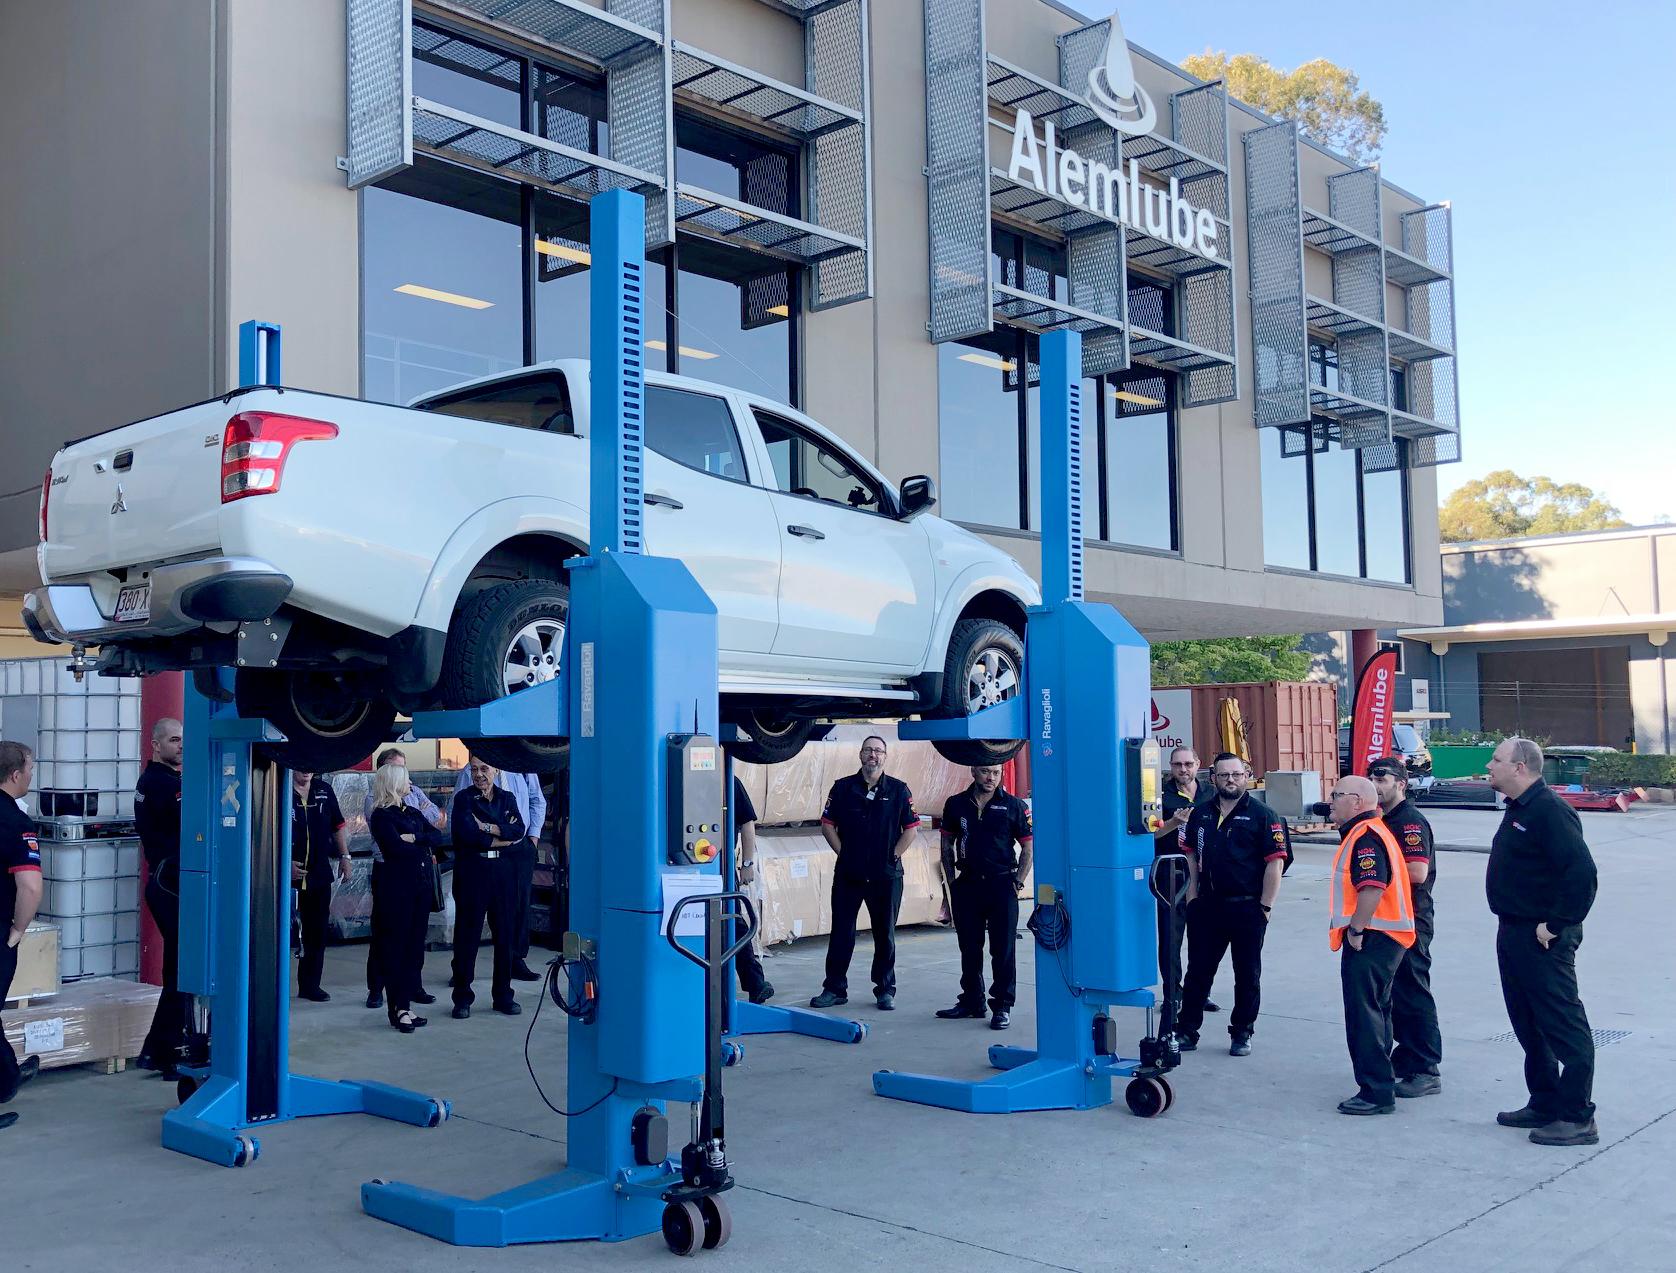 Repco Sales Team visit Alemlube Queensland